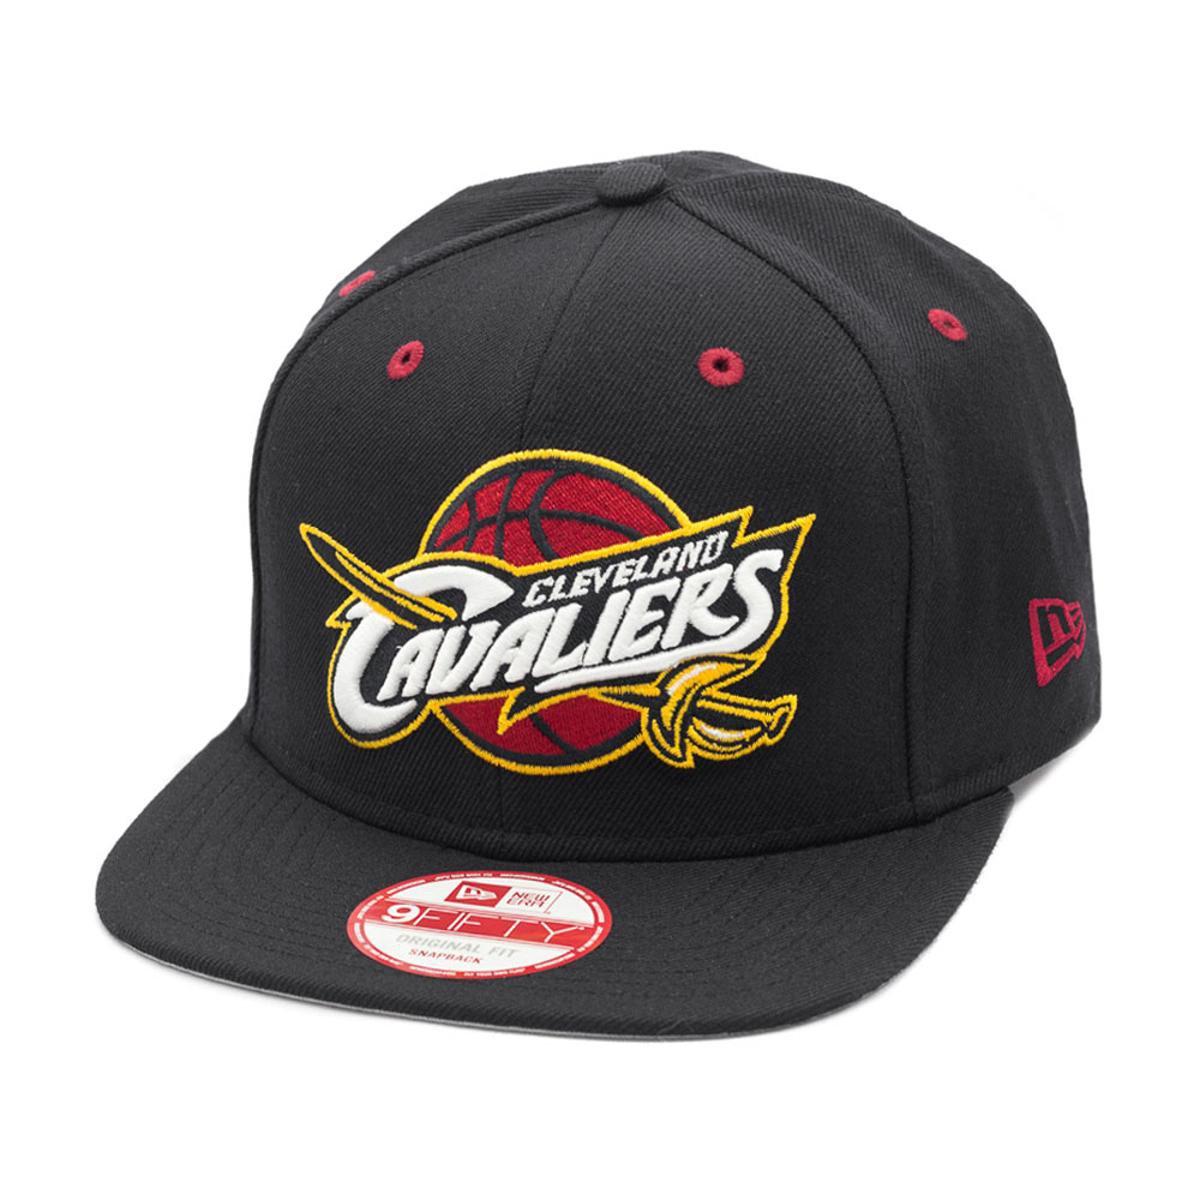 Boné New Era Snapback Original Fit Cleveland Cavaliers - NBA - Compre Agora   ec7a8688c4d